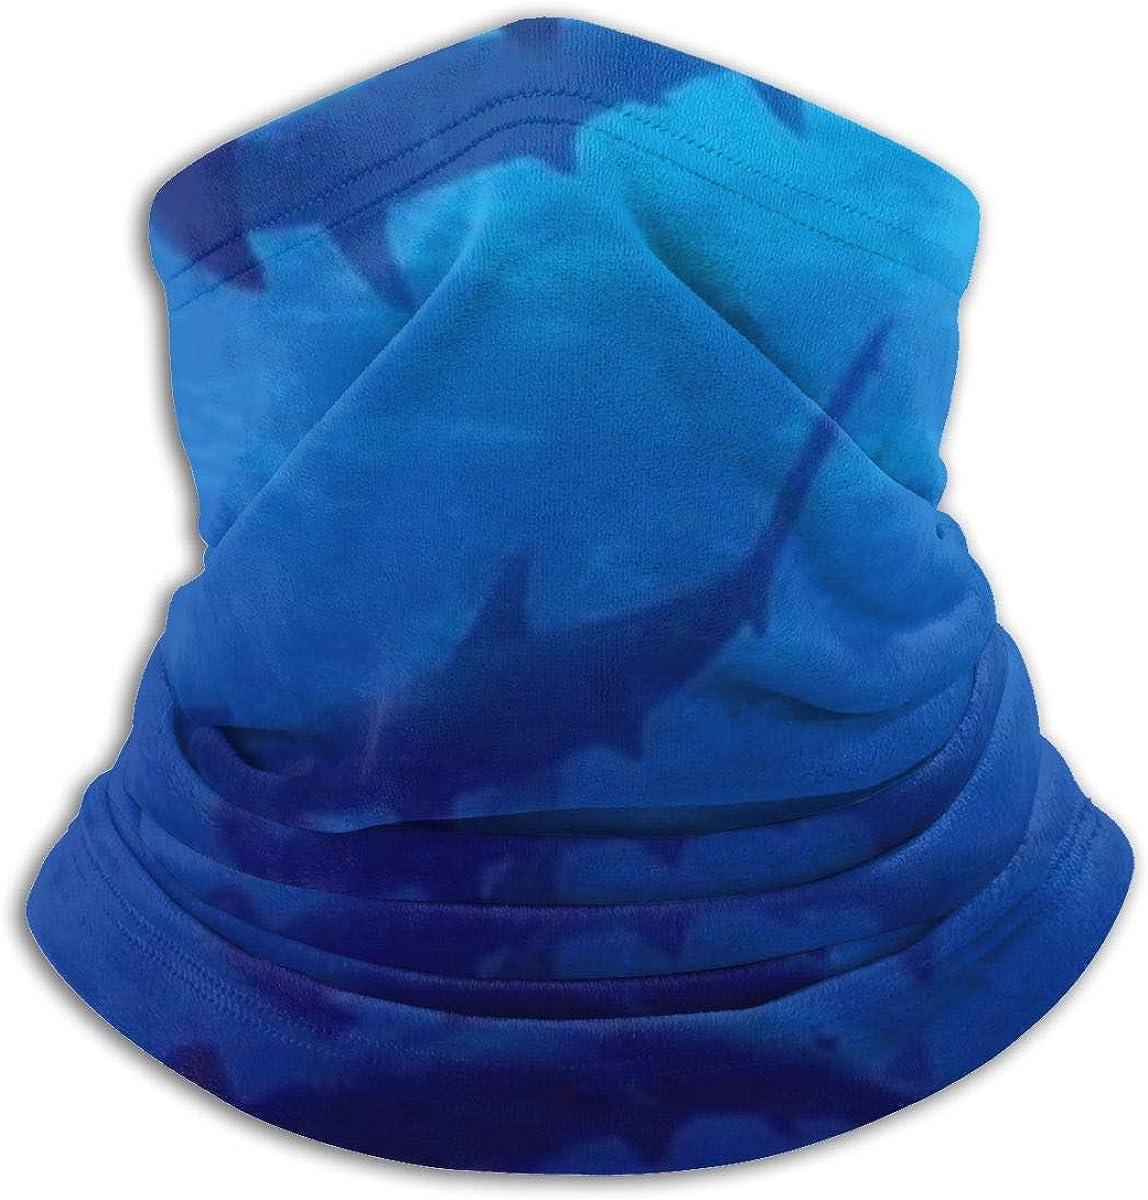 Seamless Bandana Soccer DNA Face Mask Women Men for Dust Wind Sun Protection